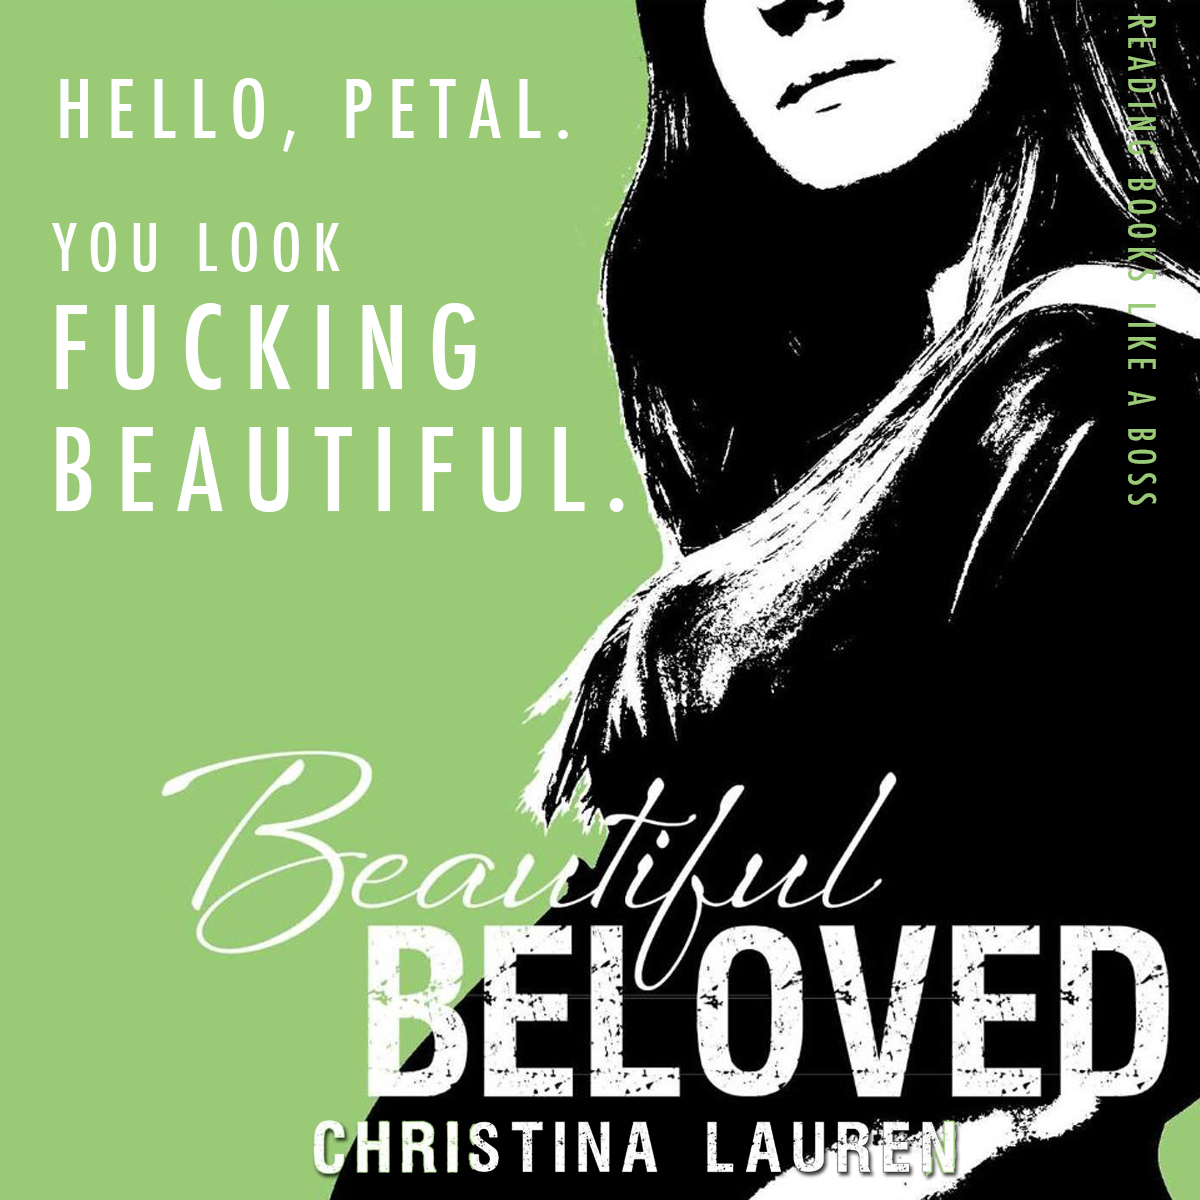 Beautiful Beloved by Christina Lauren